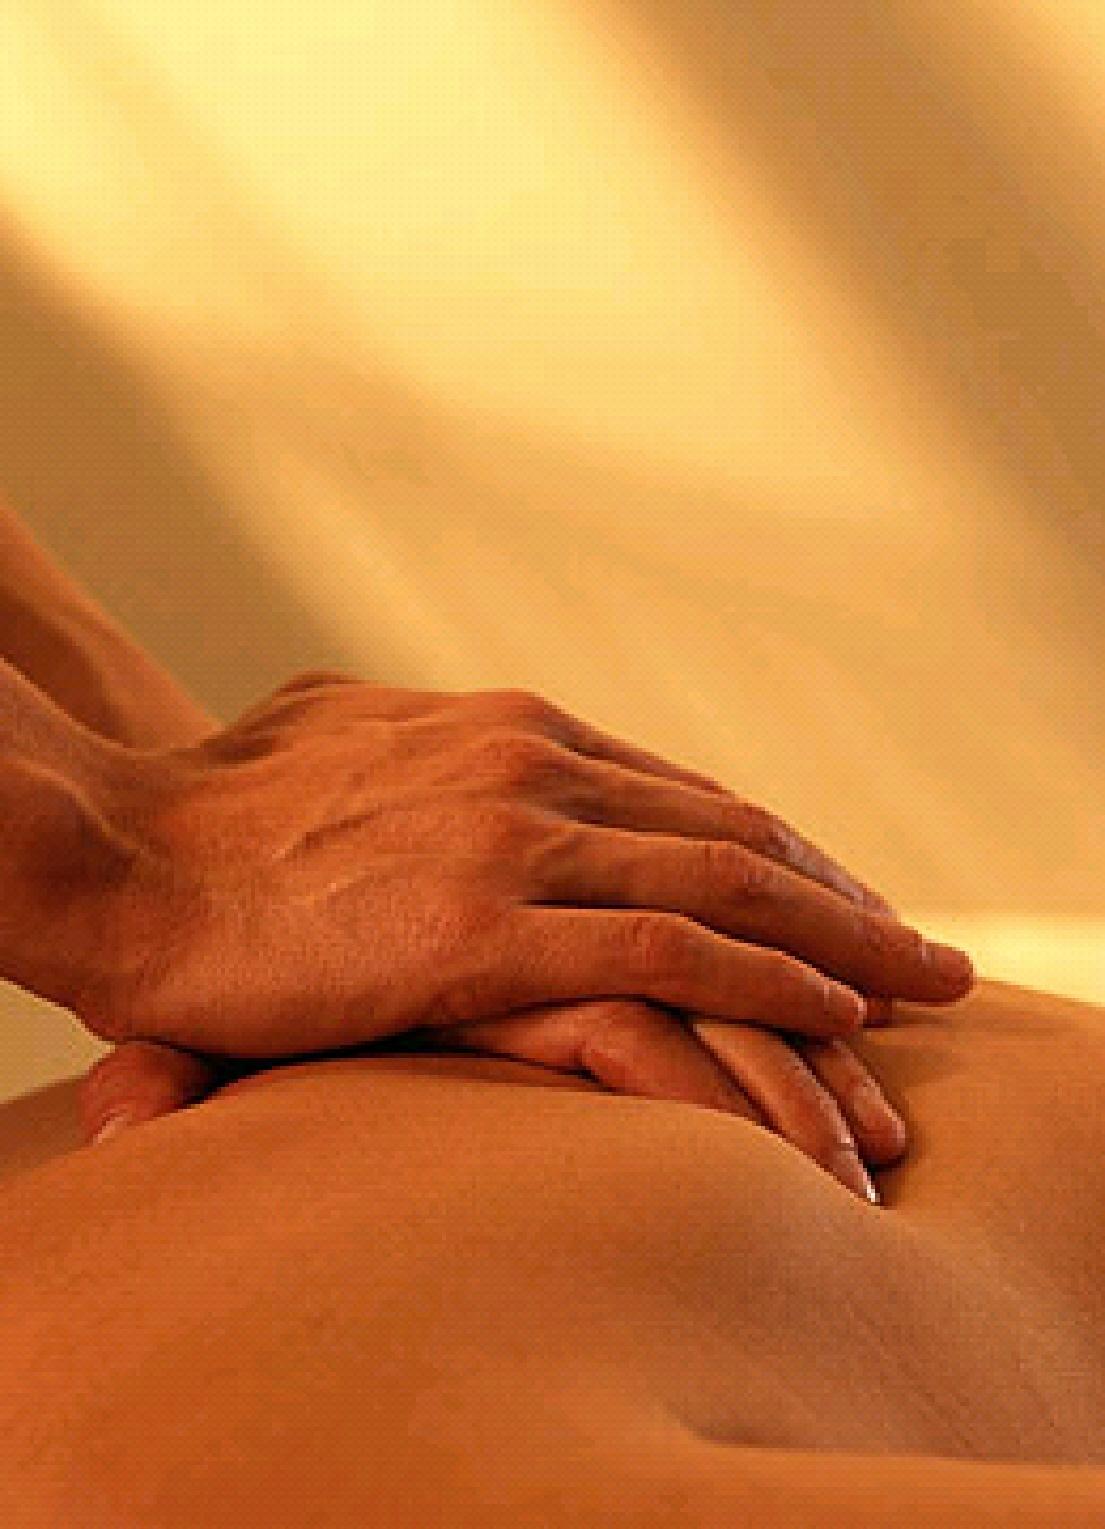 Фото руки массажиста 14 фотография